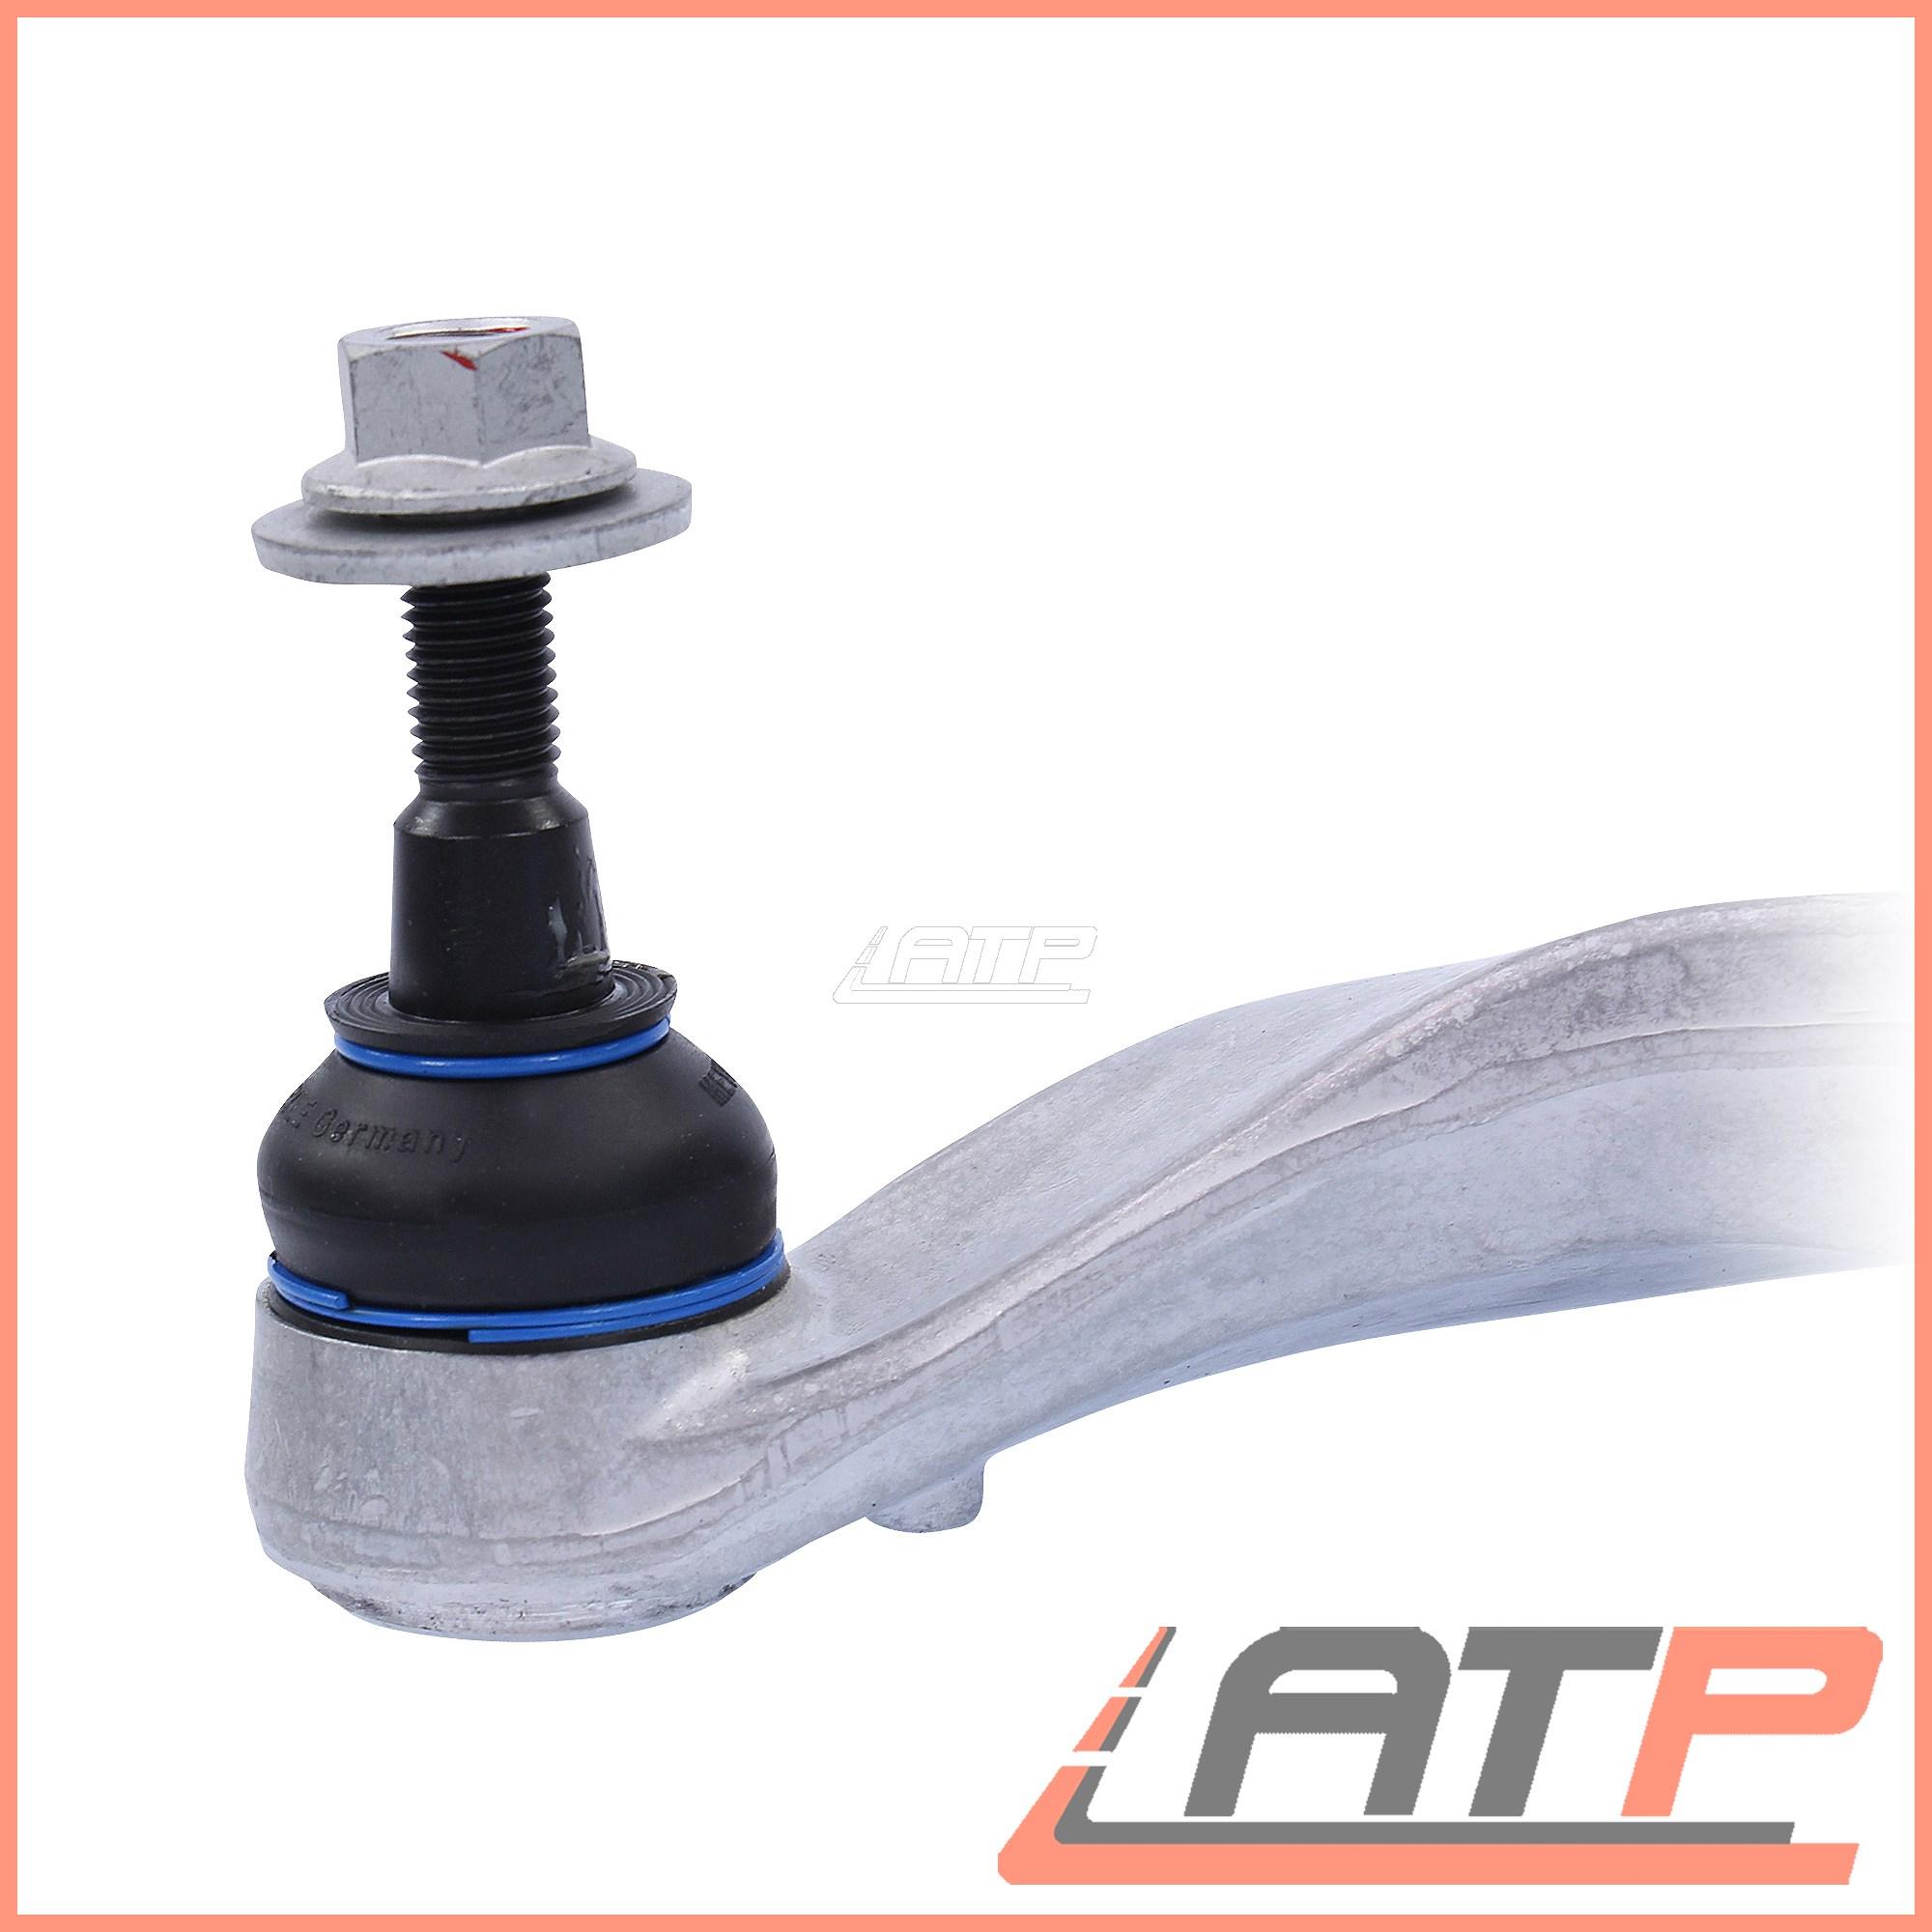 2X MEYLE CONTROL ARM WISHBONE LOWER FRONT AUDI A6 4B C5 97-05 A8 4D 94-02